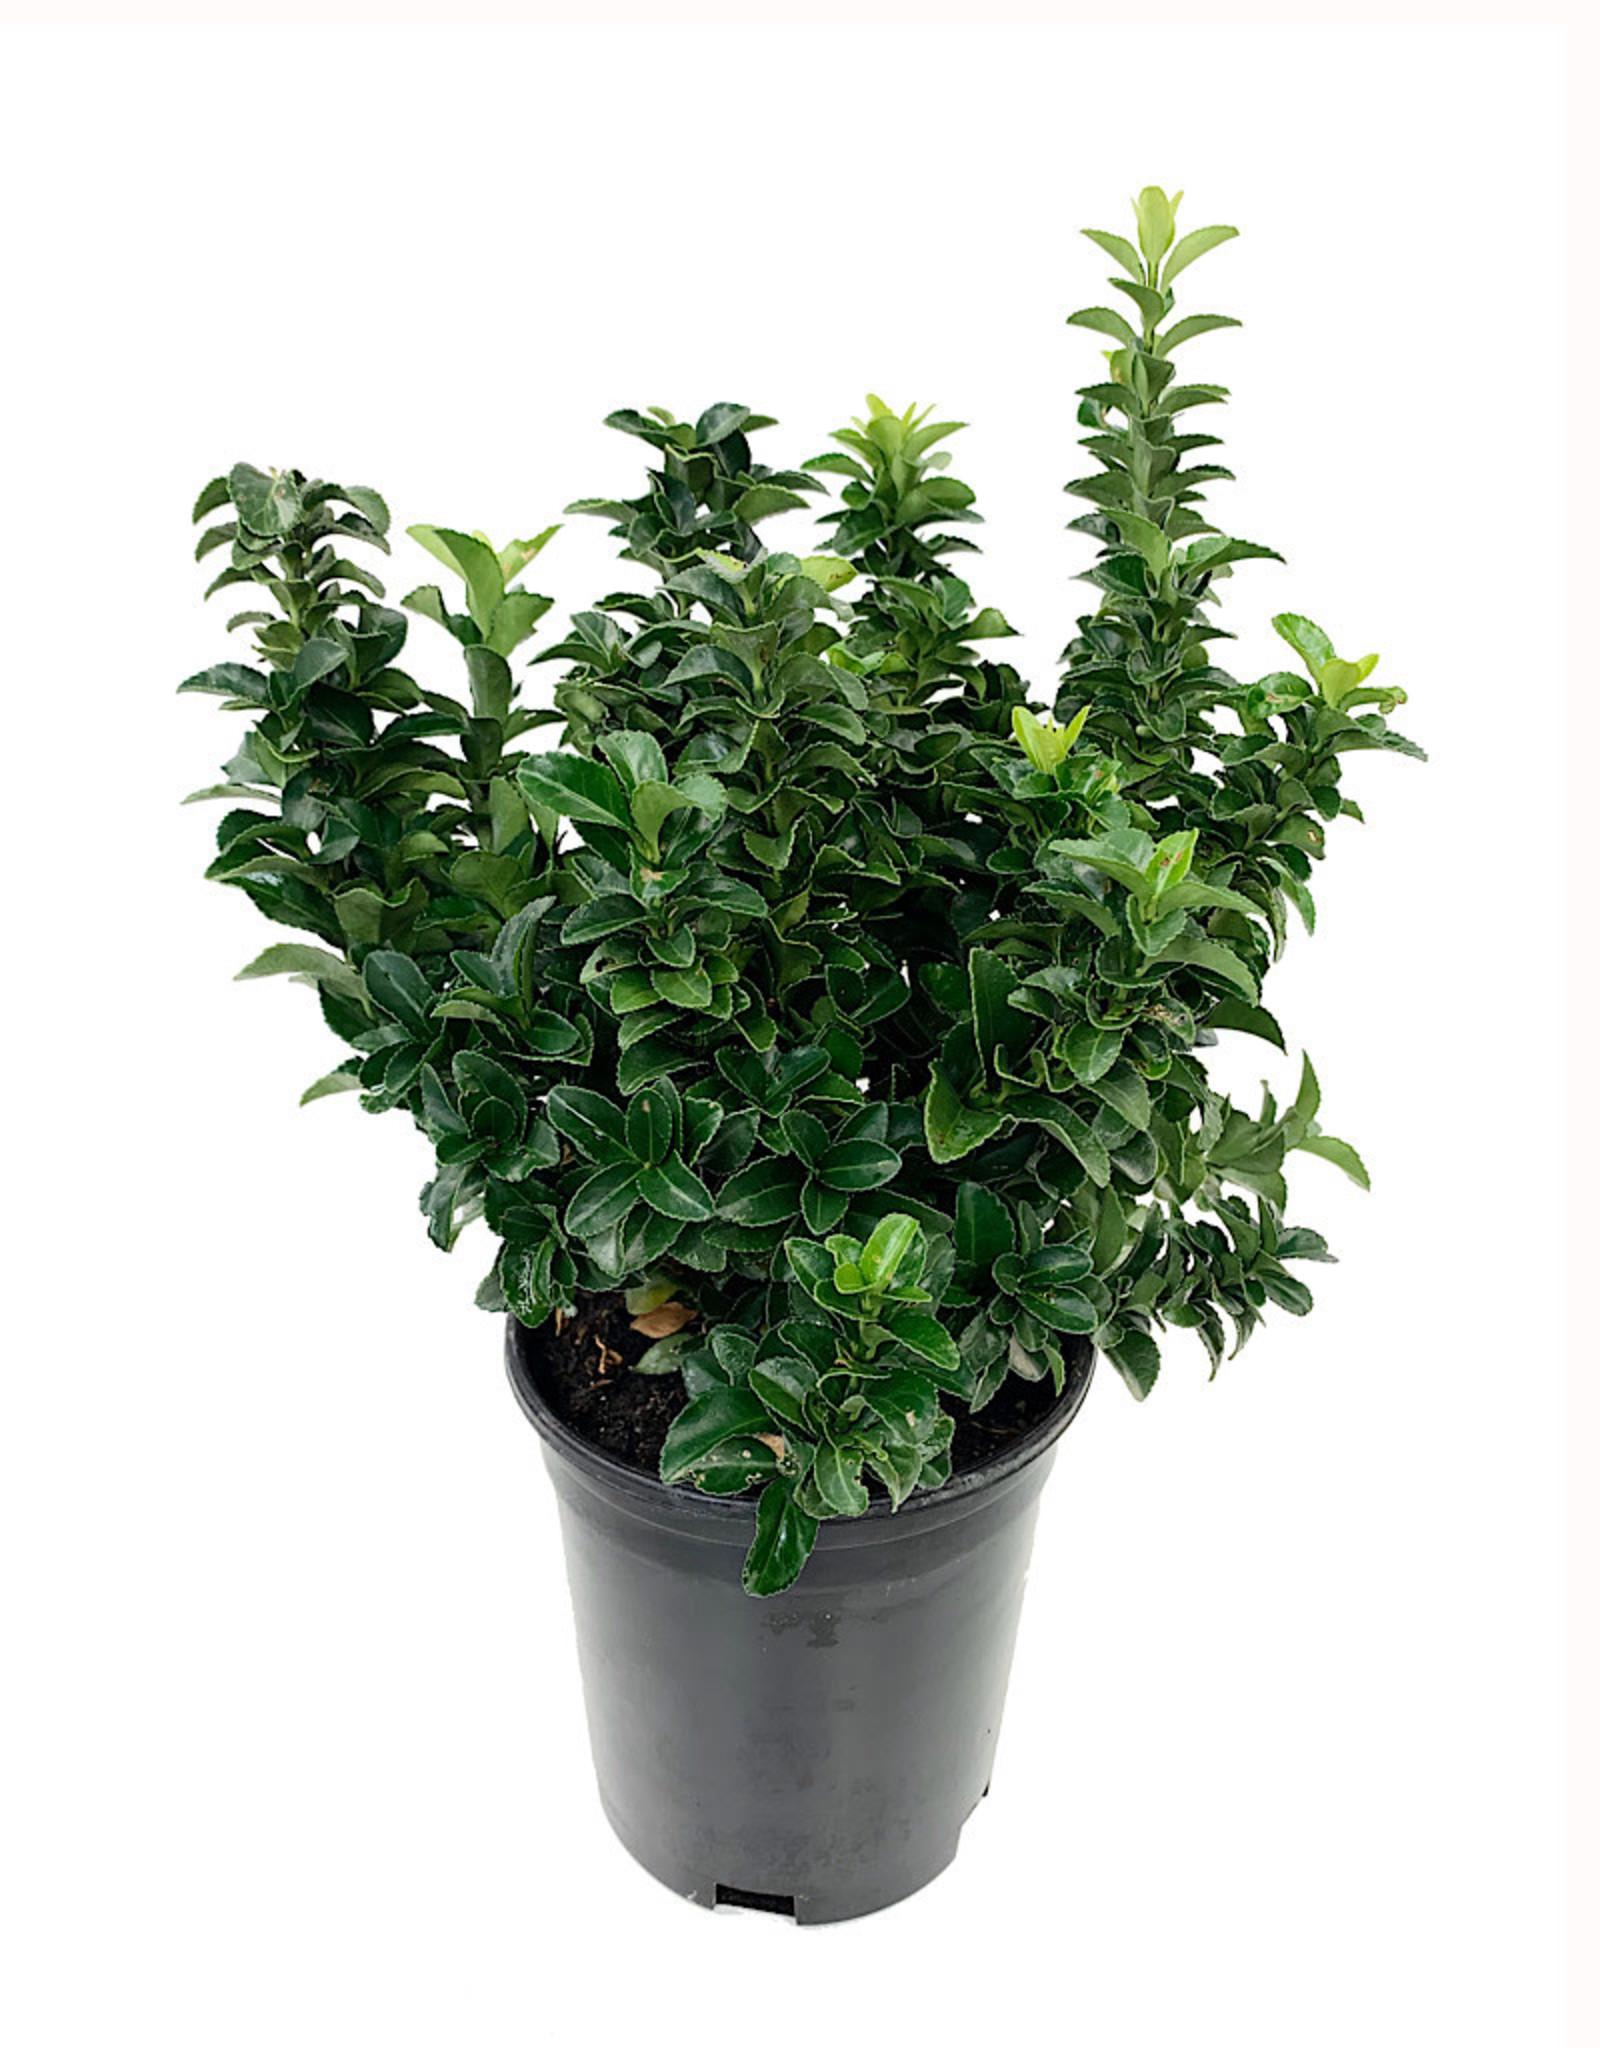 Euonymus japonicus 'Green Spire' 1 Gallon